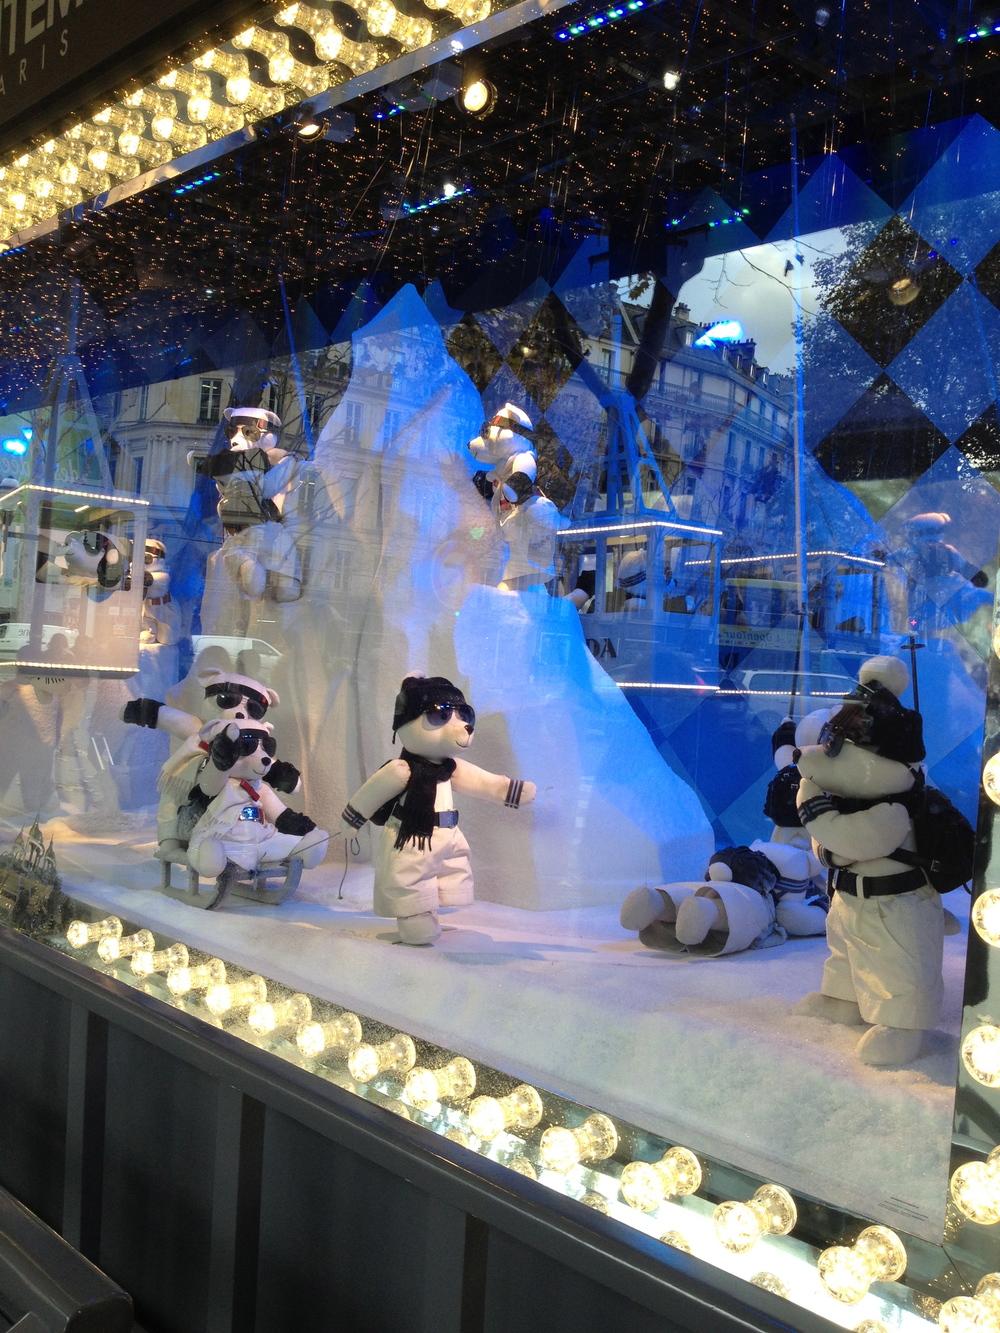 Printemps Prada snow window display with each mechanical teddy wearing a mini Prada backpack.